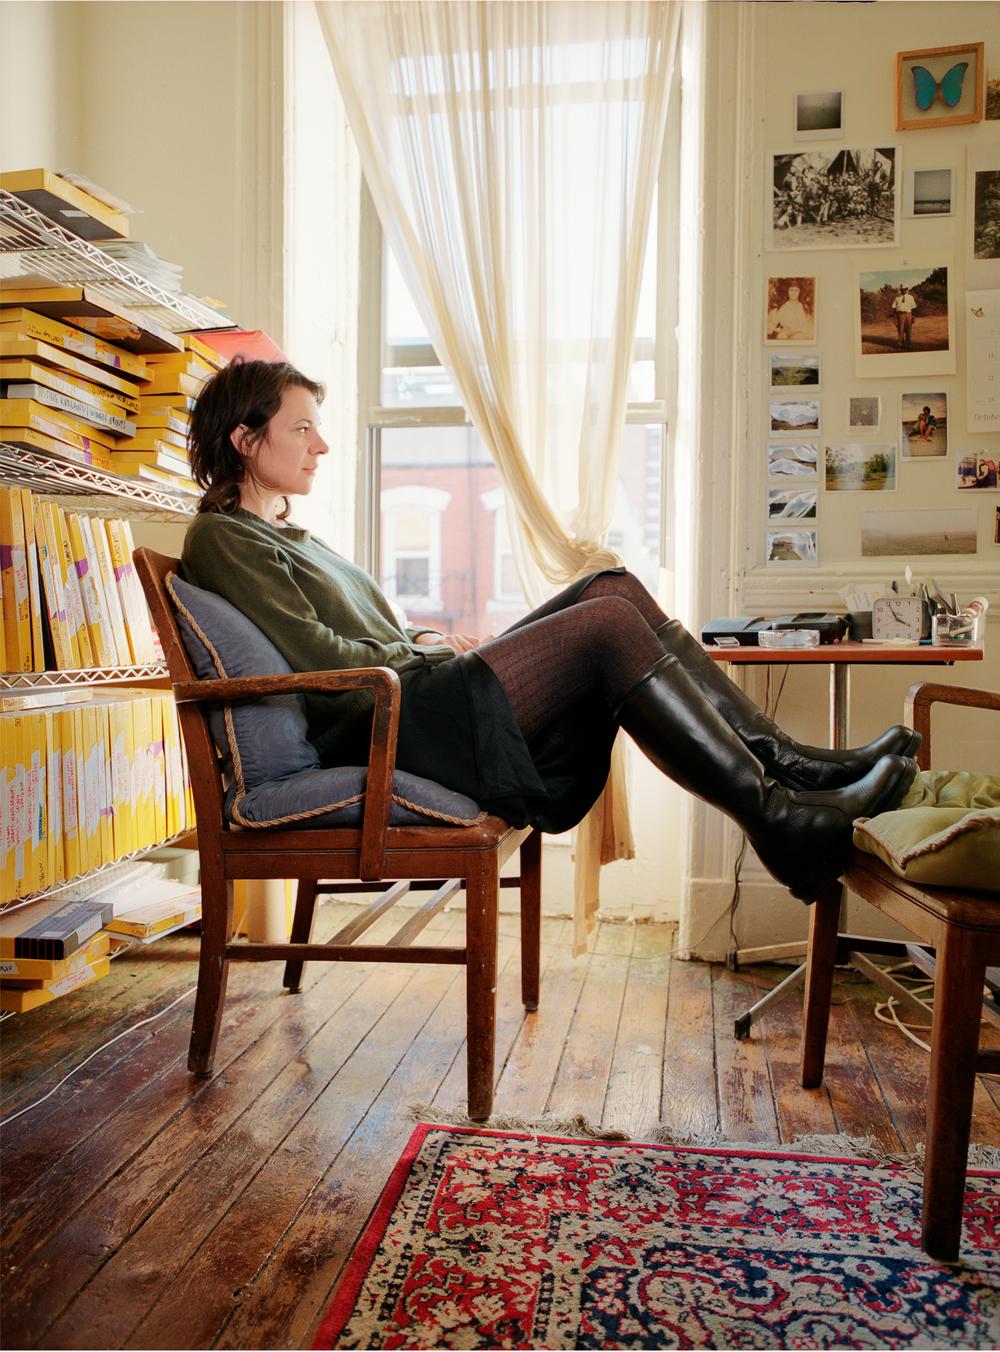 Justine Kurland, artist